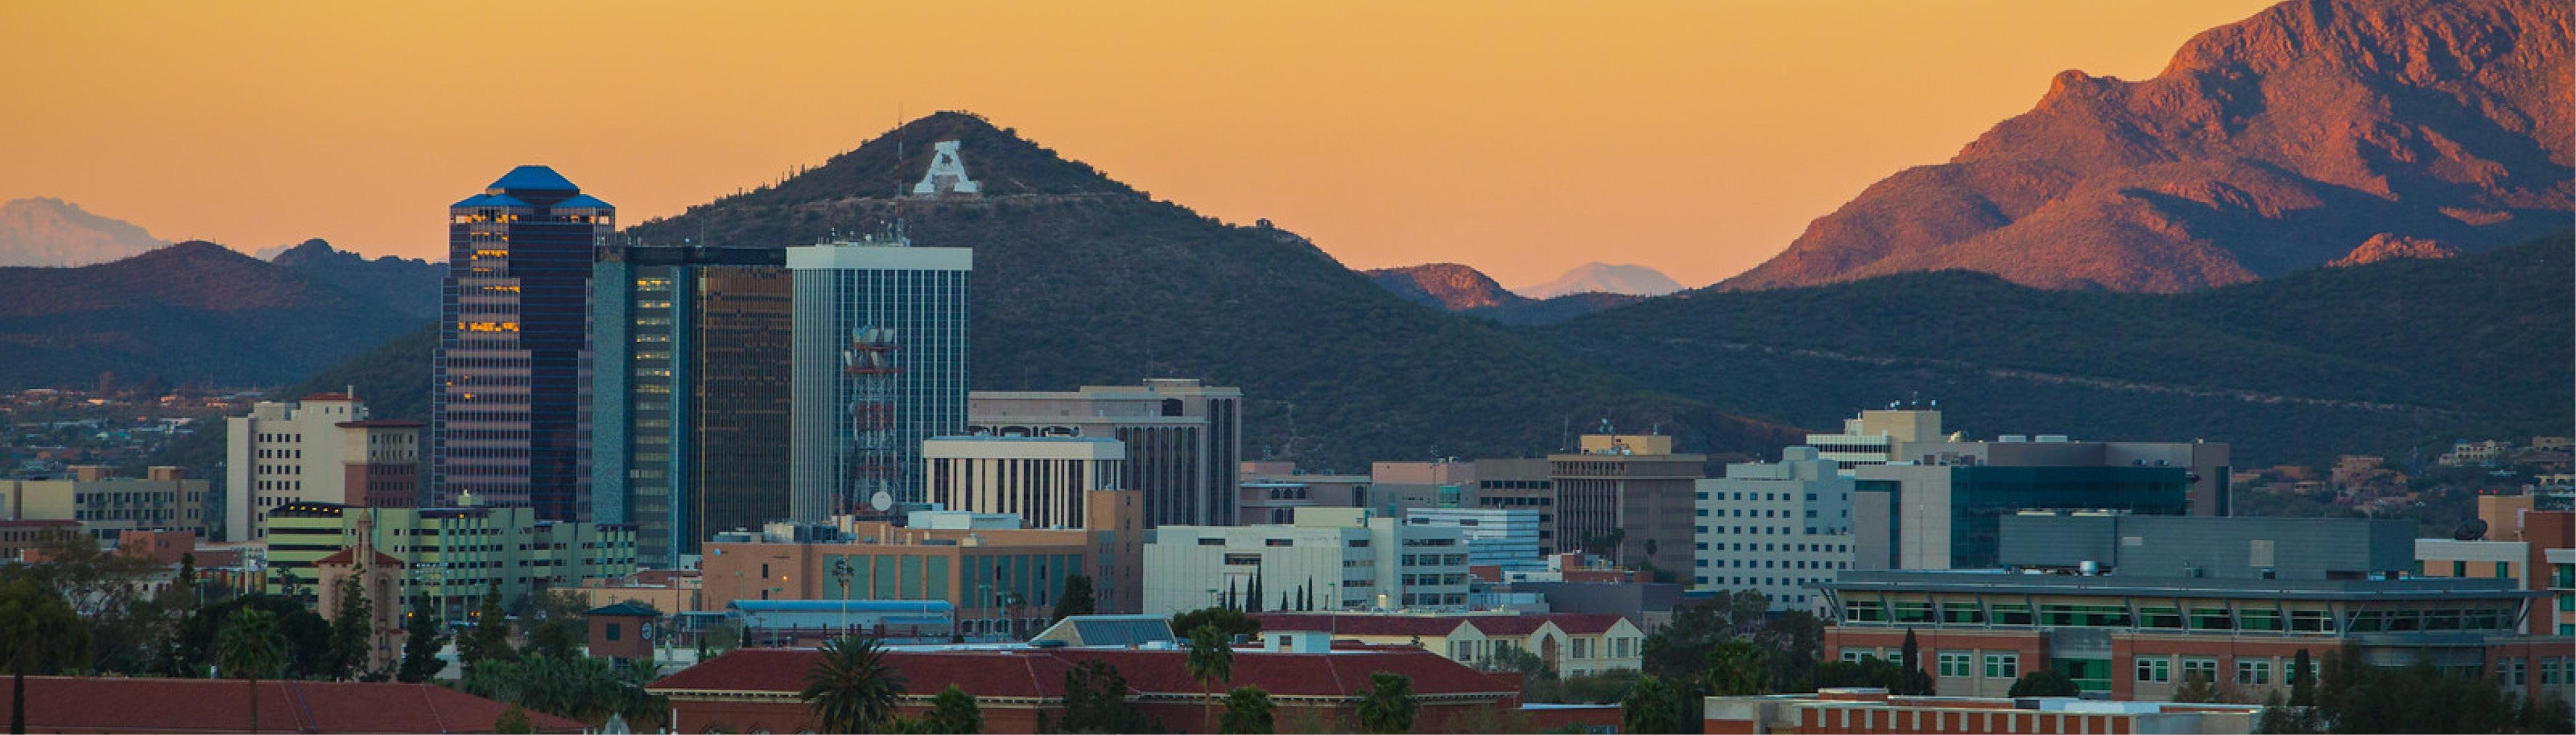 "University of Arizona and ""A"" mountain"